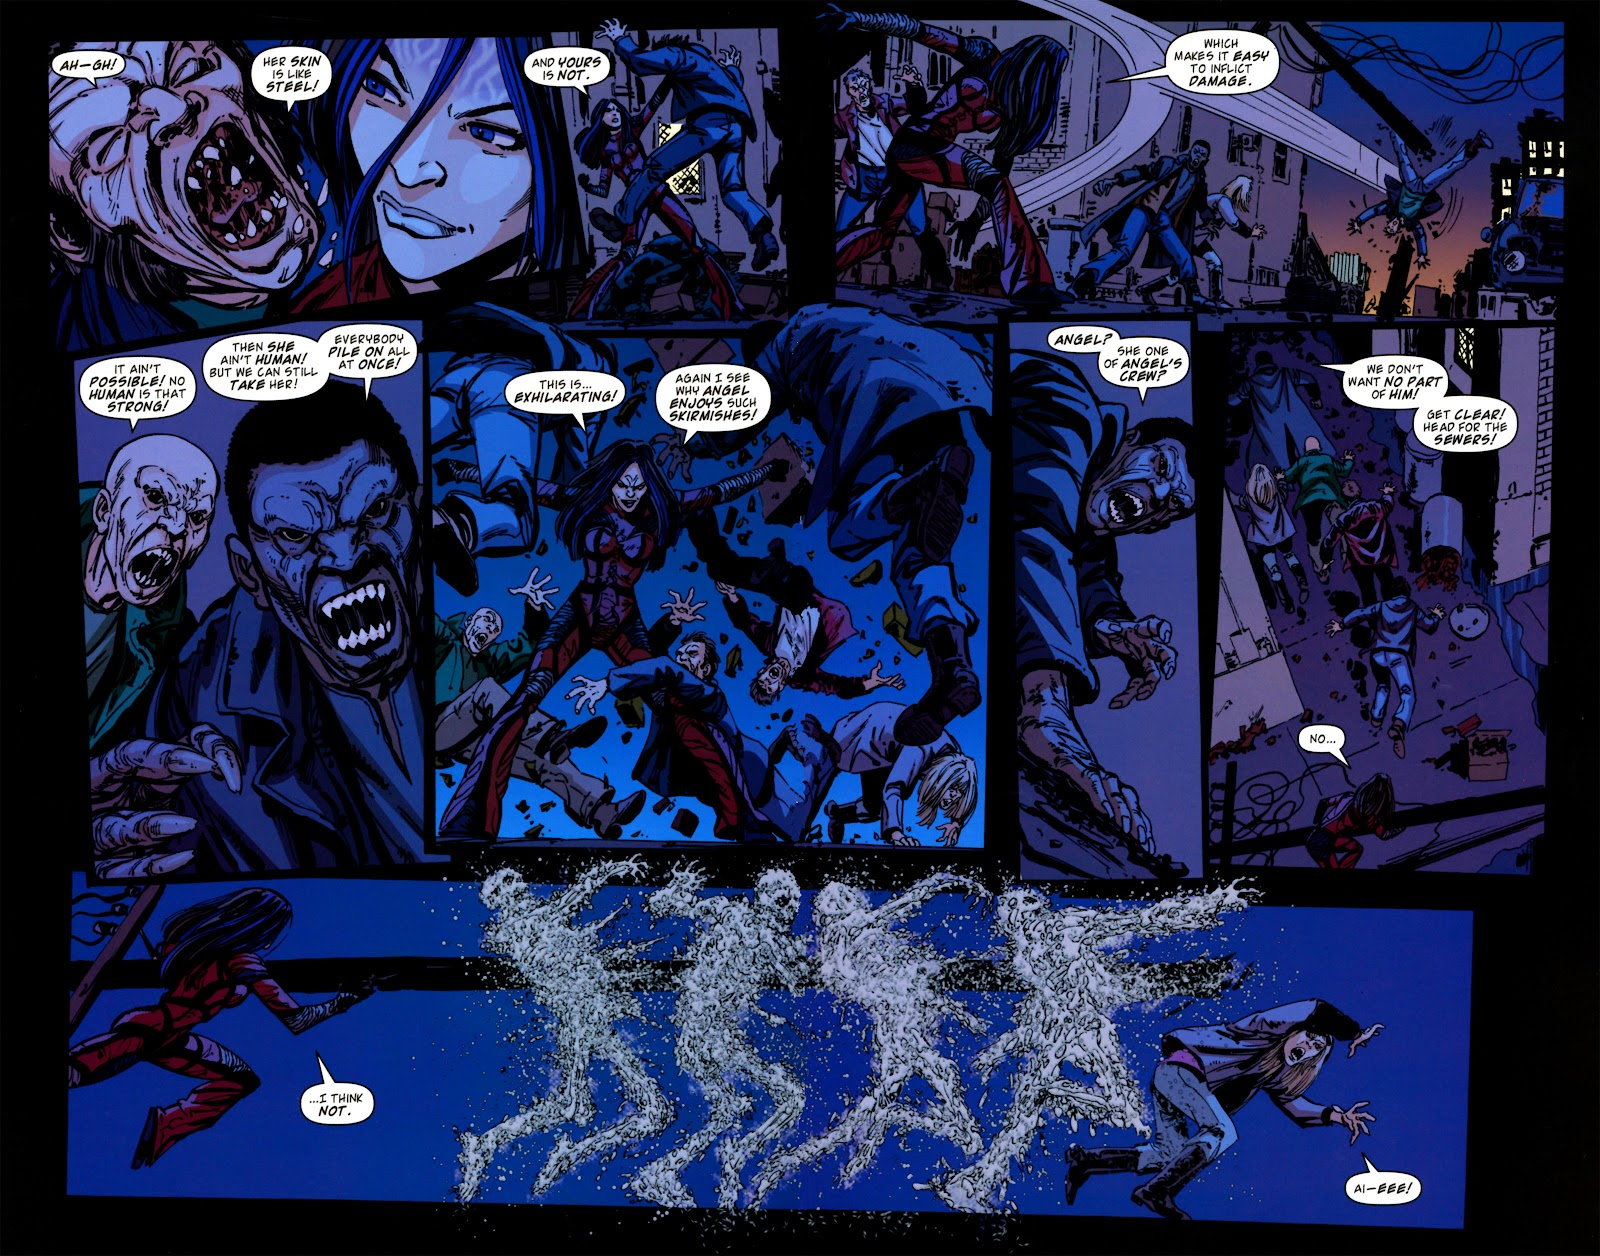 Angel Special Lorne Full | Viewcomic reading comics online